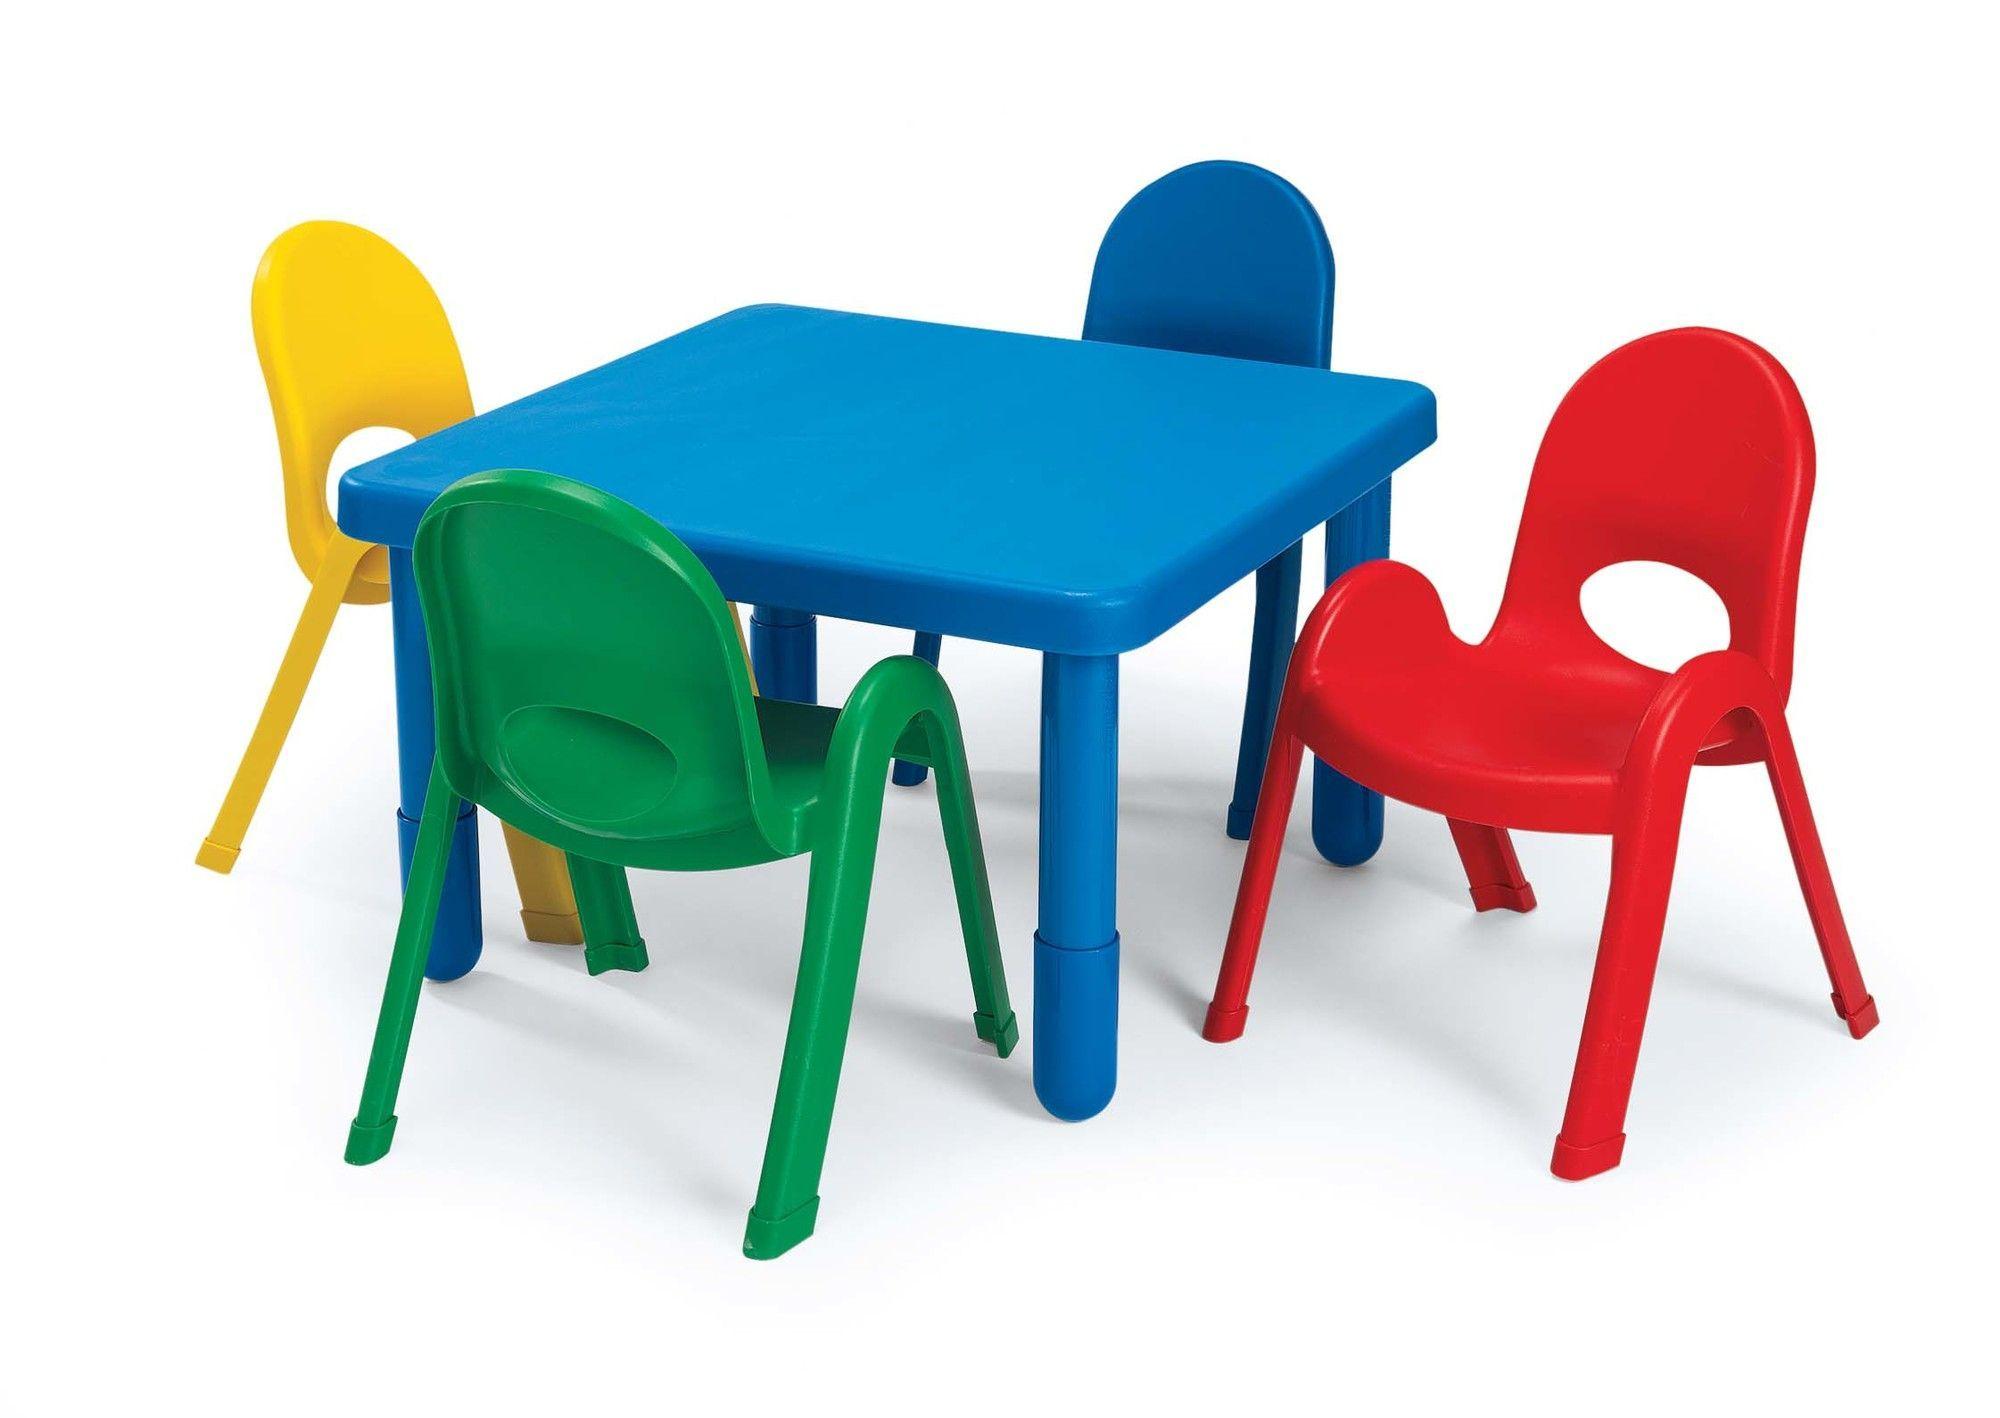 Myvalue Set Kids Square Play Activity Table And Chair Set High Table And Chairs Table And Chair Sets Kids Table And Chairs Preschool table and chairs set